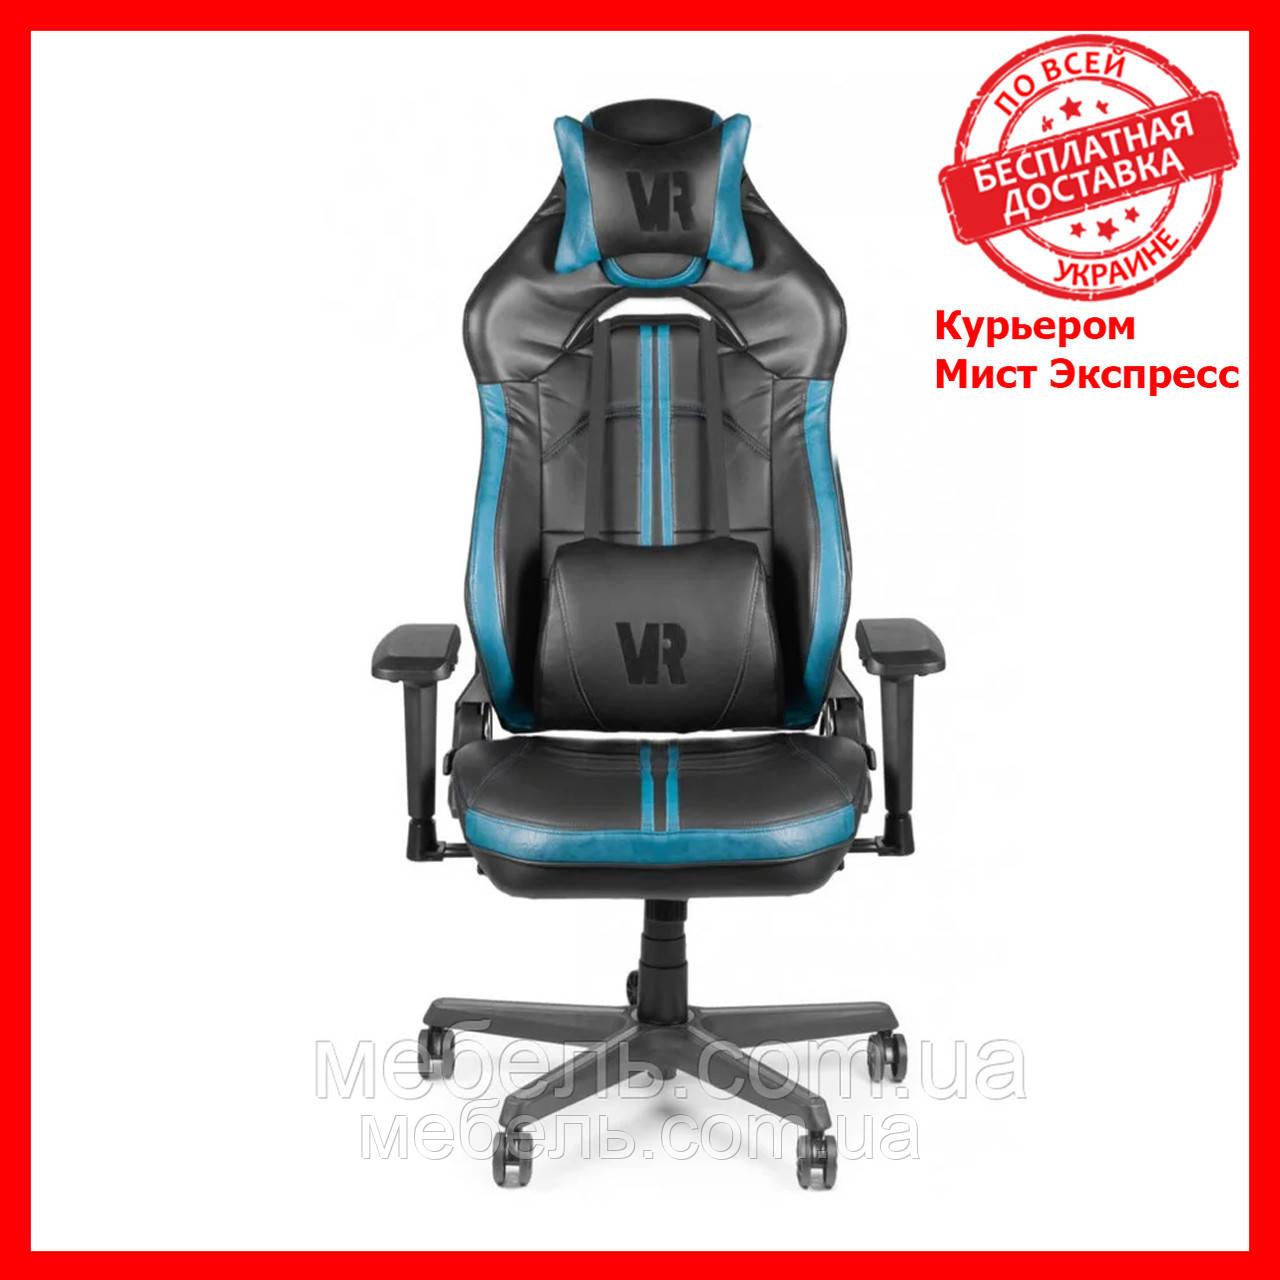 Геймерское компьютерное кресло Barsky VR Cyberpunk Blue CYB-02